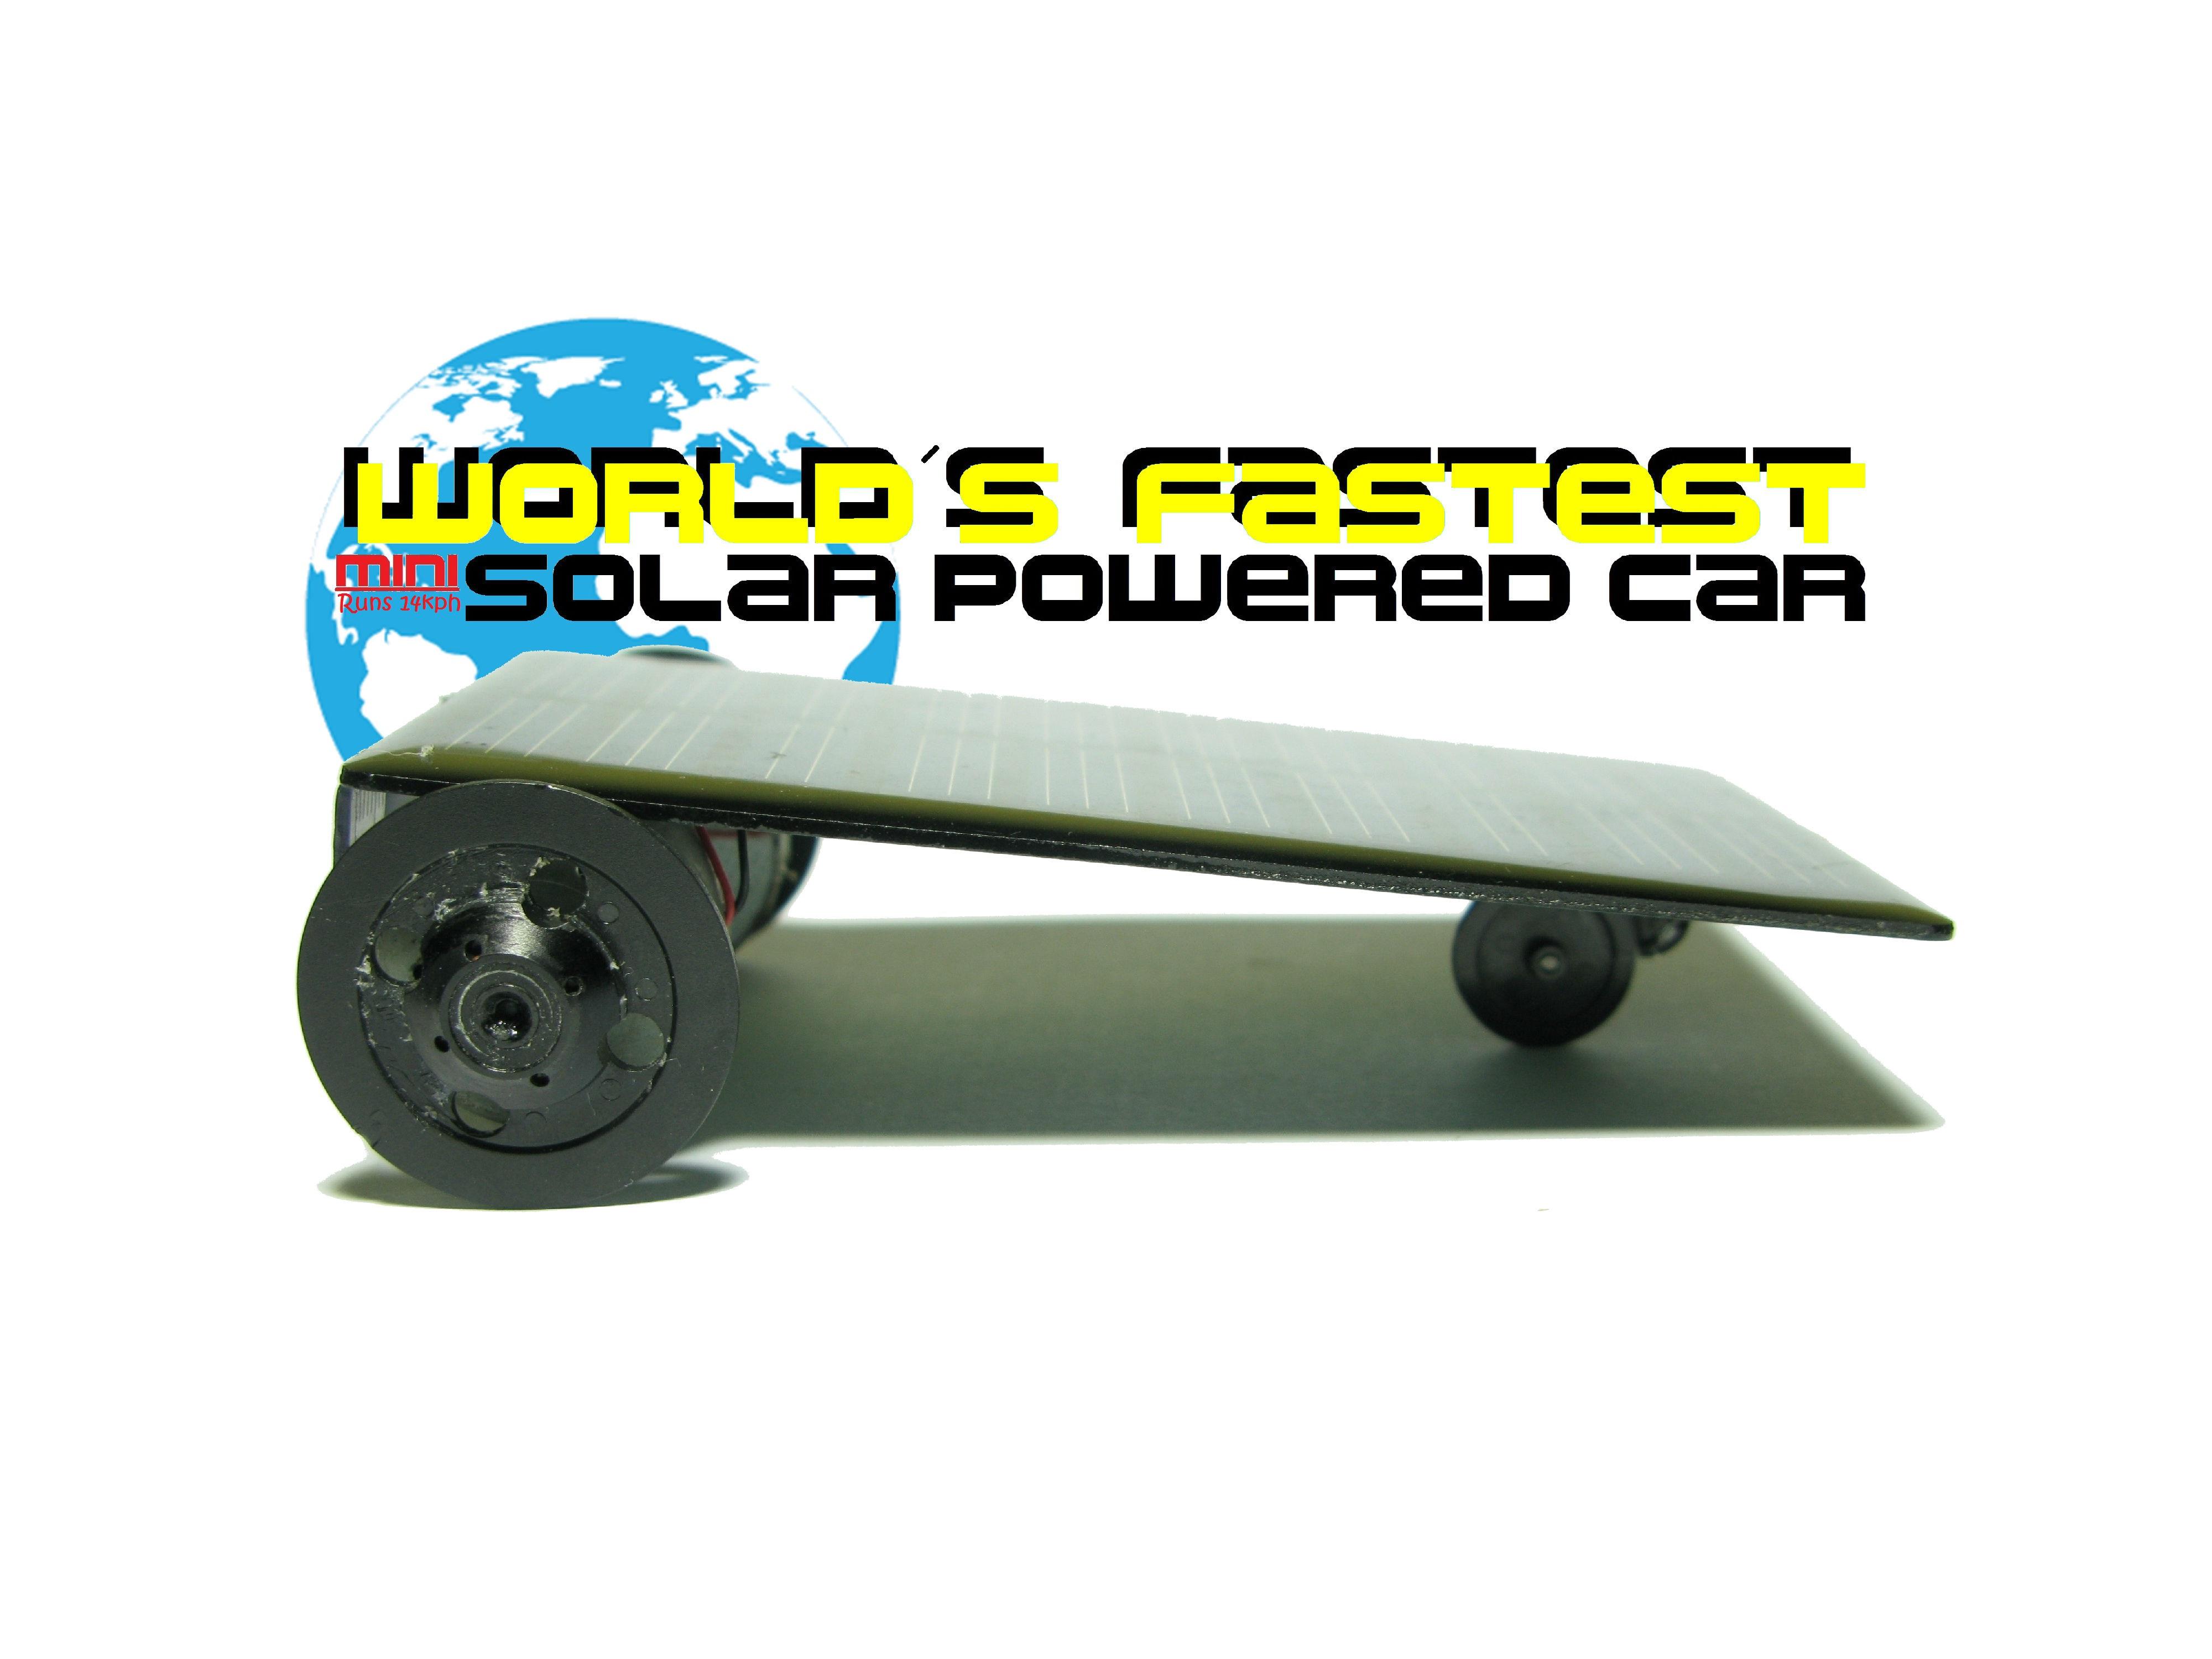 DIY Mini Solar Car! (14kph Toy)